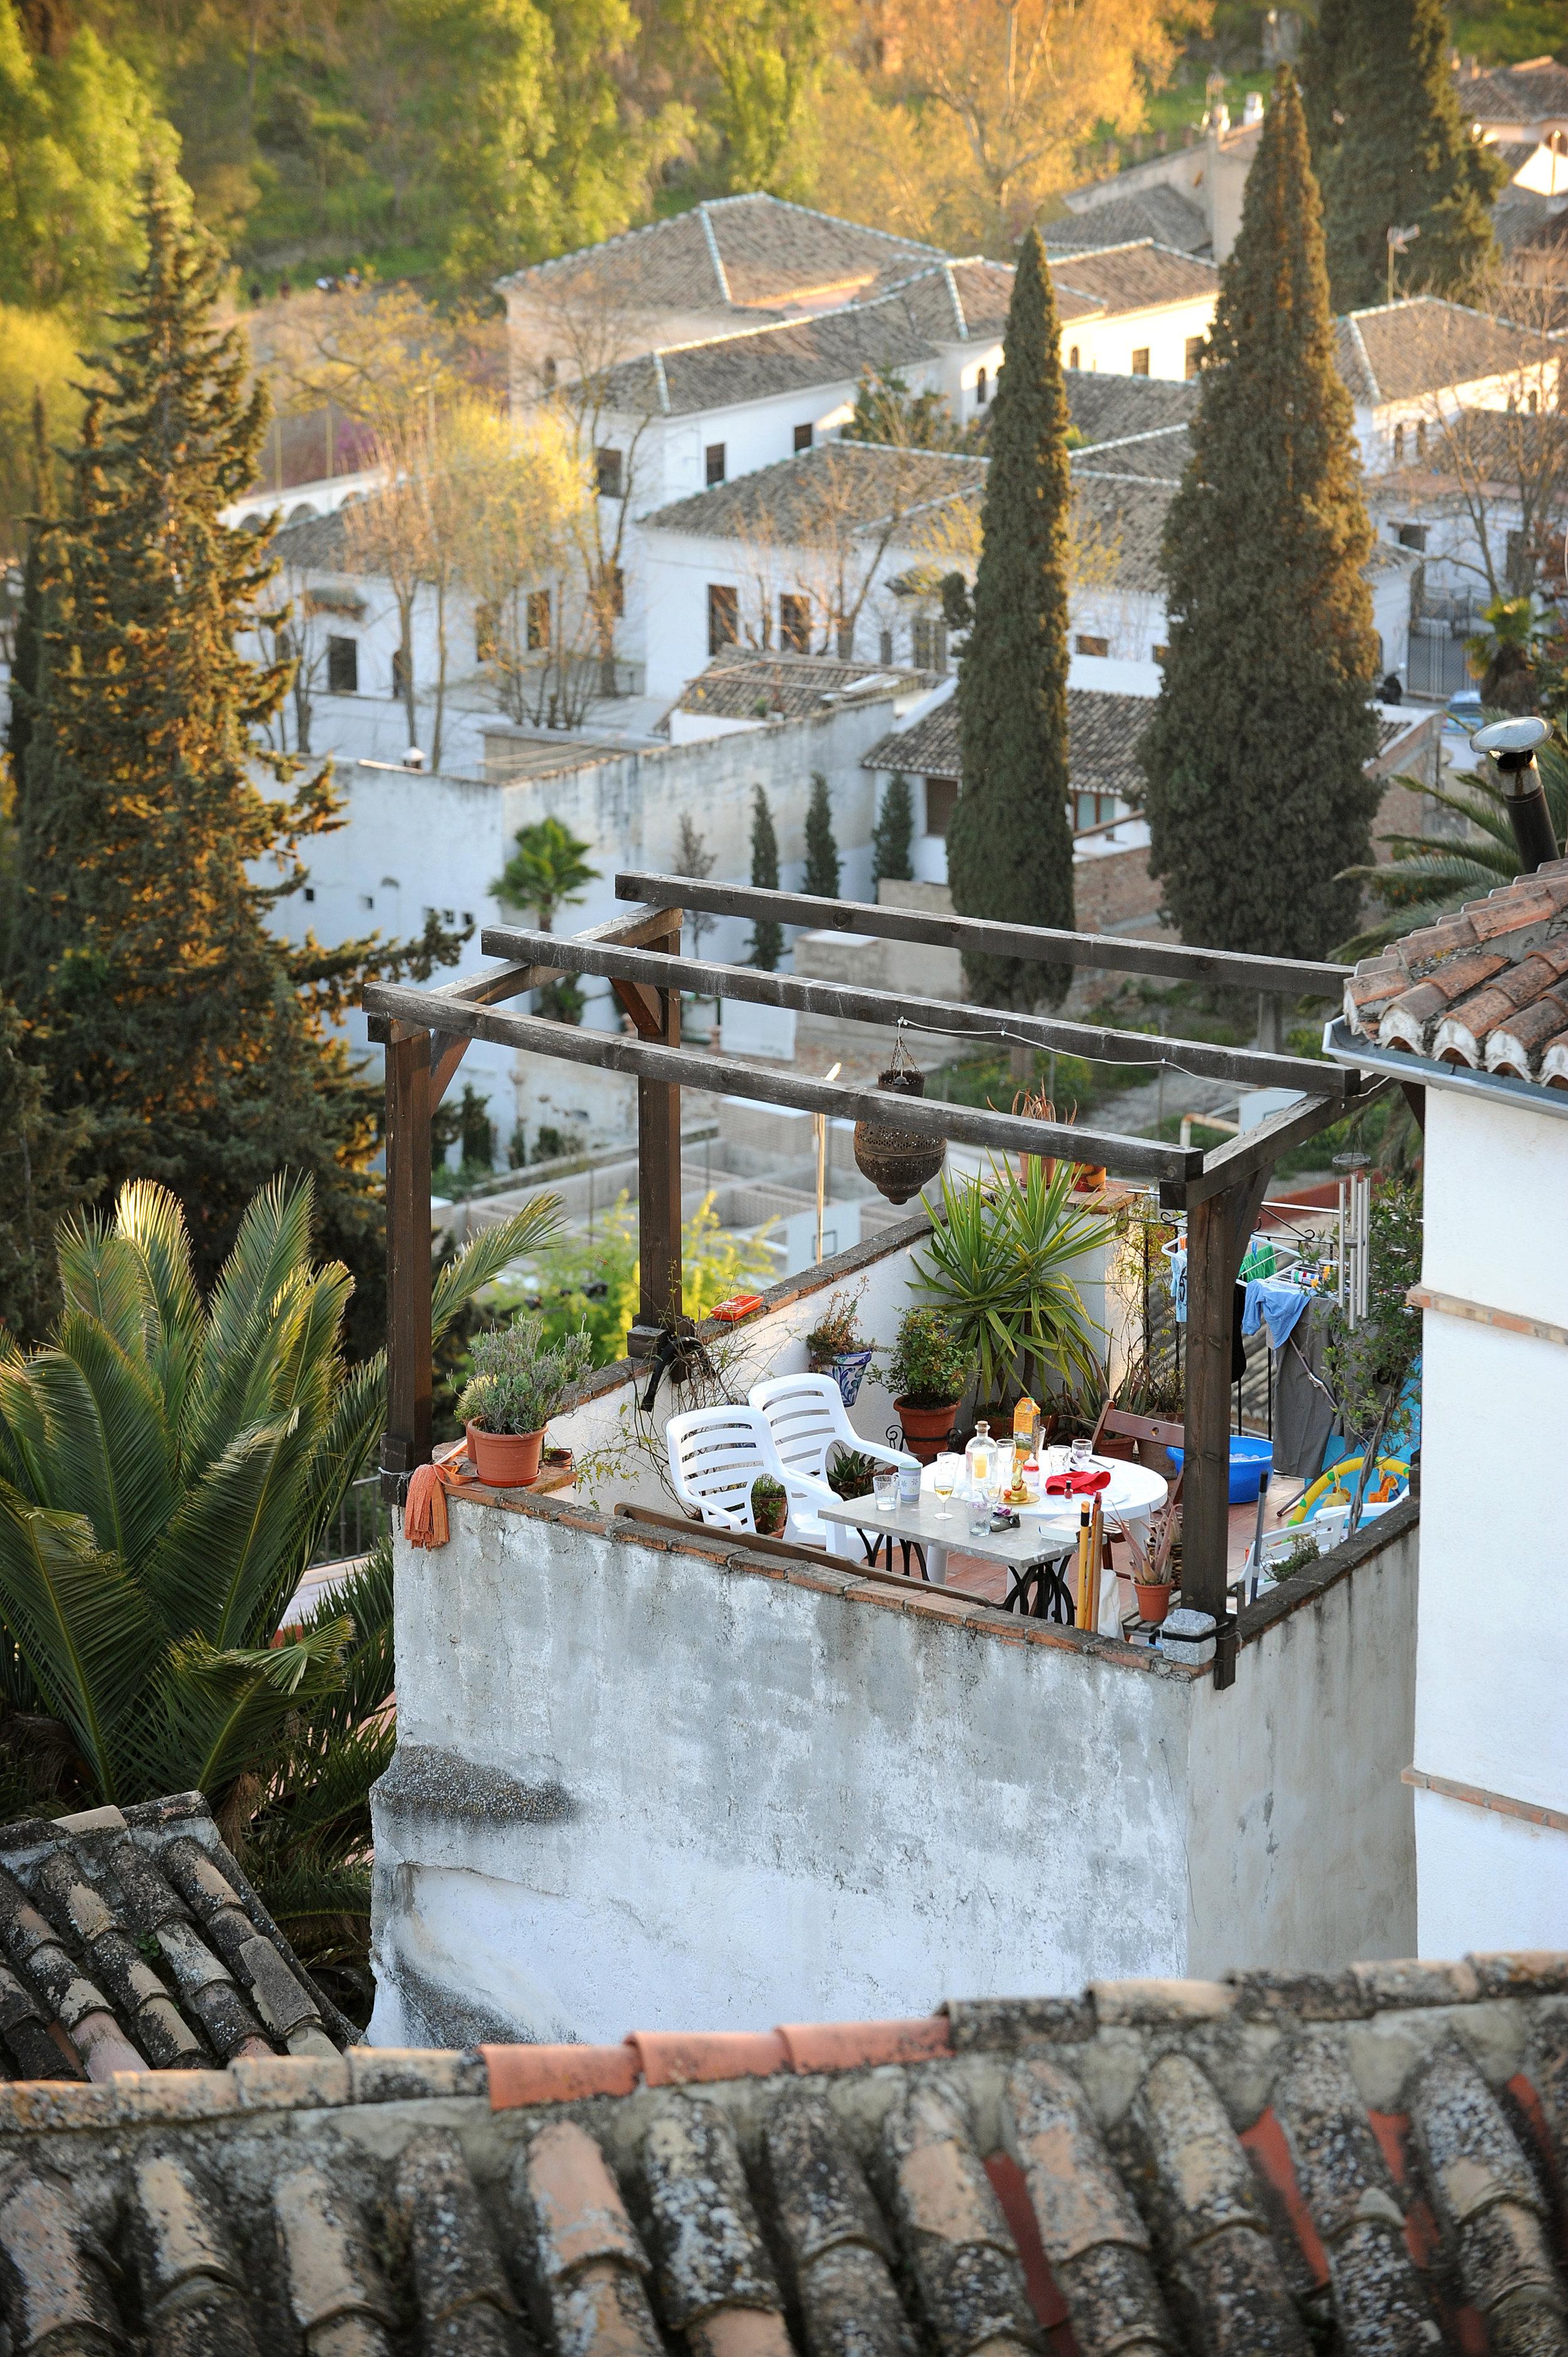 Granada, 24 h, Andalusia, Espanja, matka, matkablogi